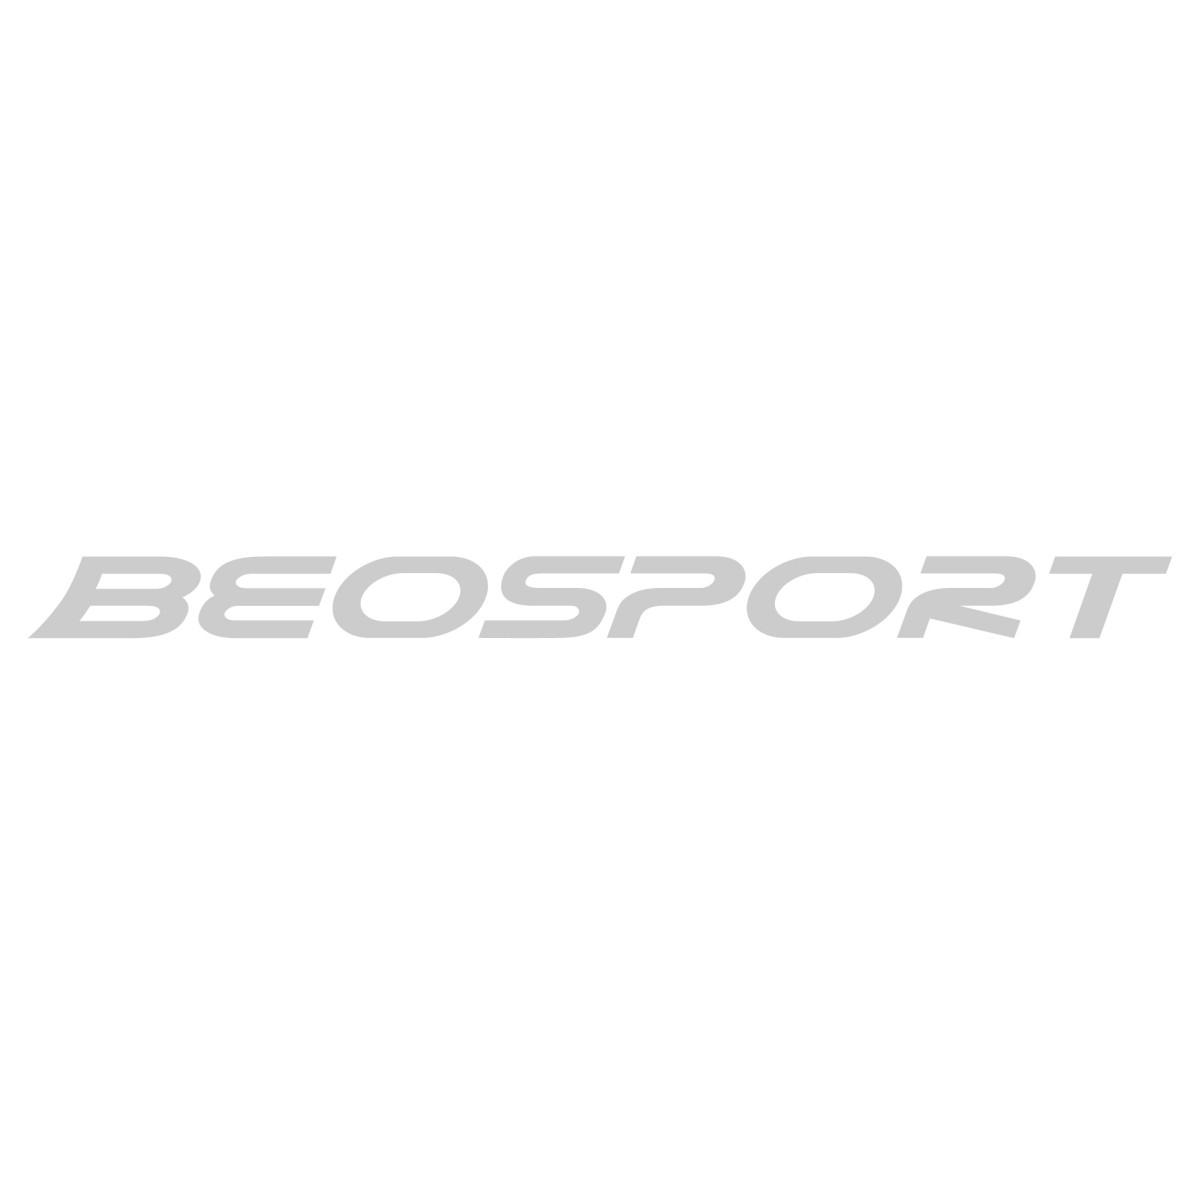 Wilson Luxilon 4g 1.25mm/12 .2 M žica za teniske rekete